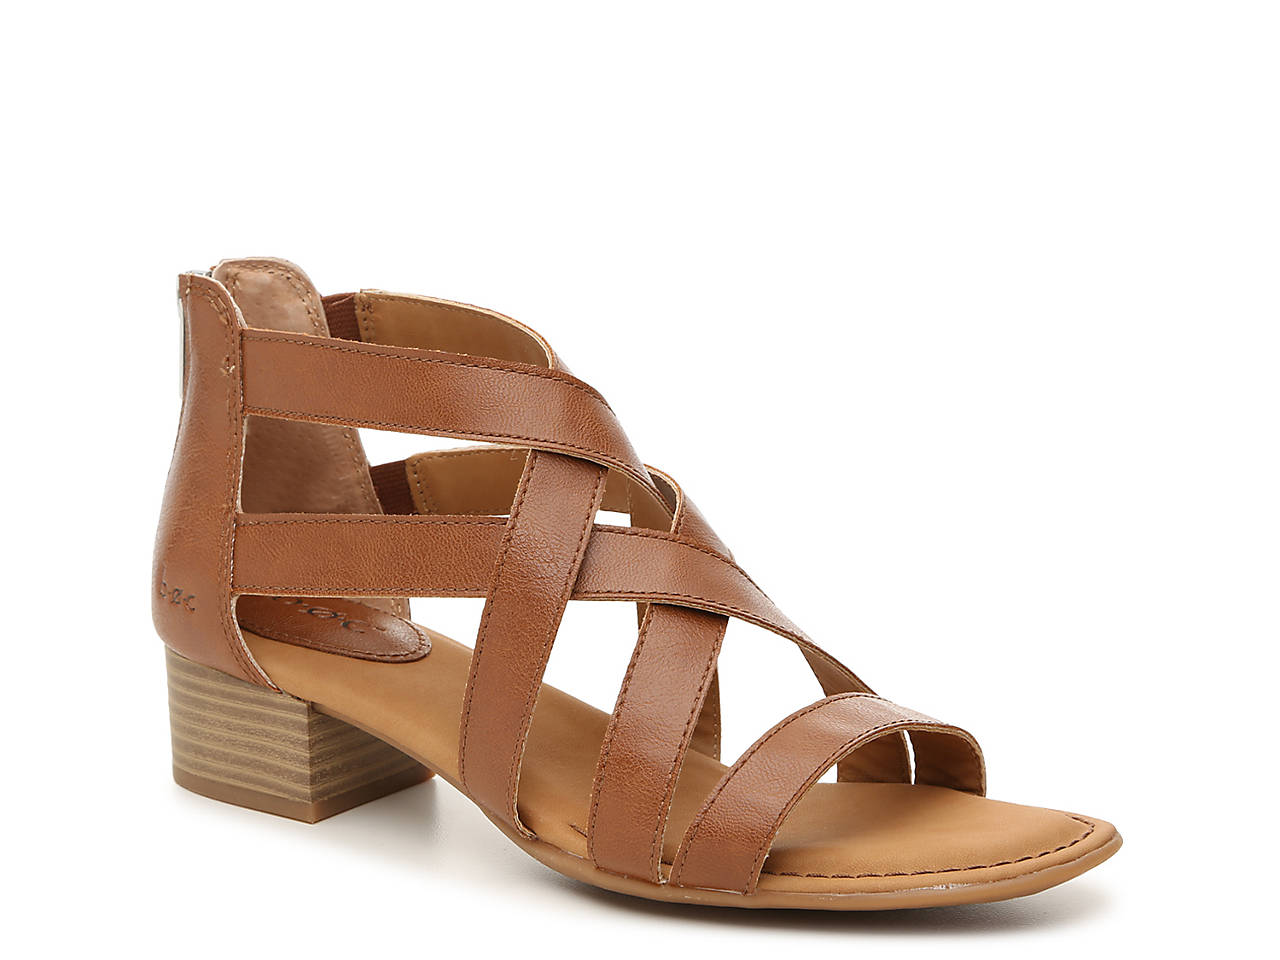 1a7ee75f7b6d93 b.o.c Ivy Sandal Women s Shoes